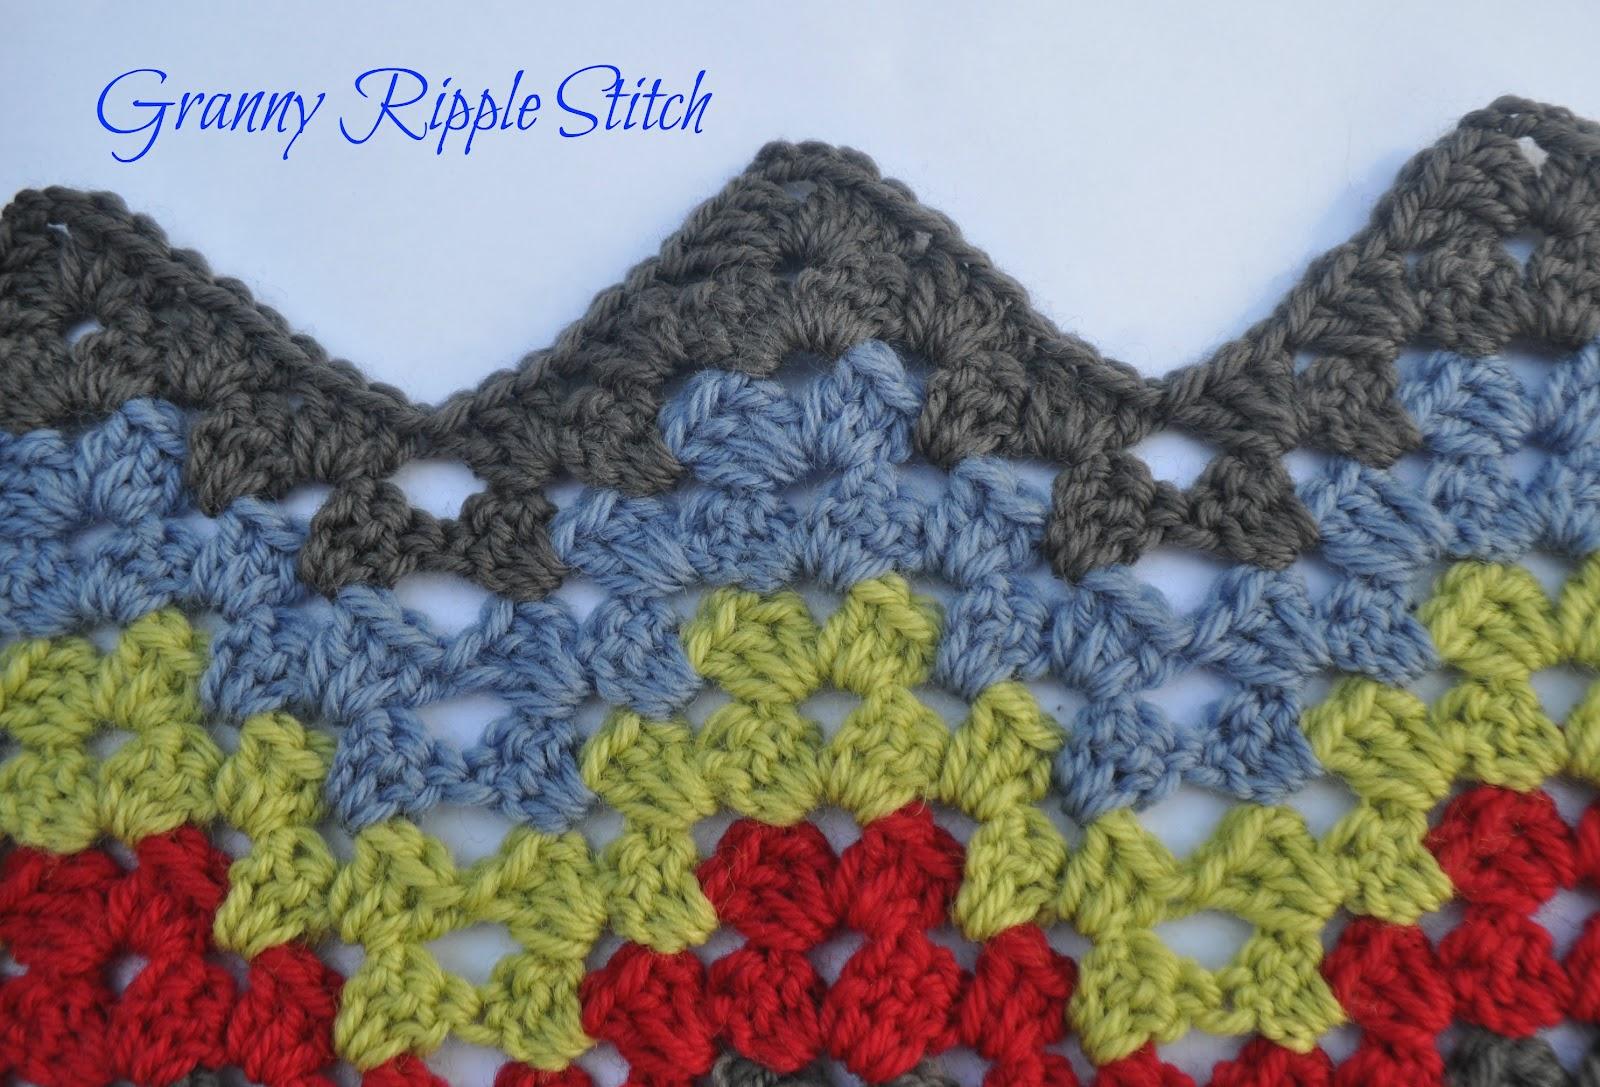 Granny Ripple Stitch Tutorial: Sew Filomena: Granny Ripple Stitch